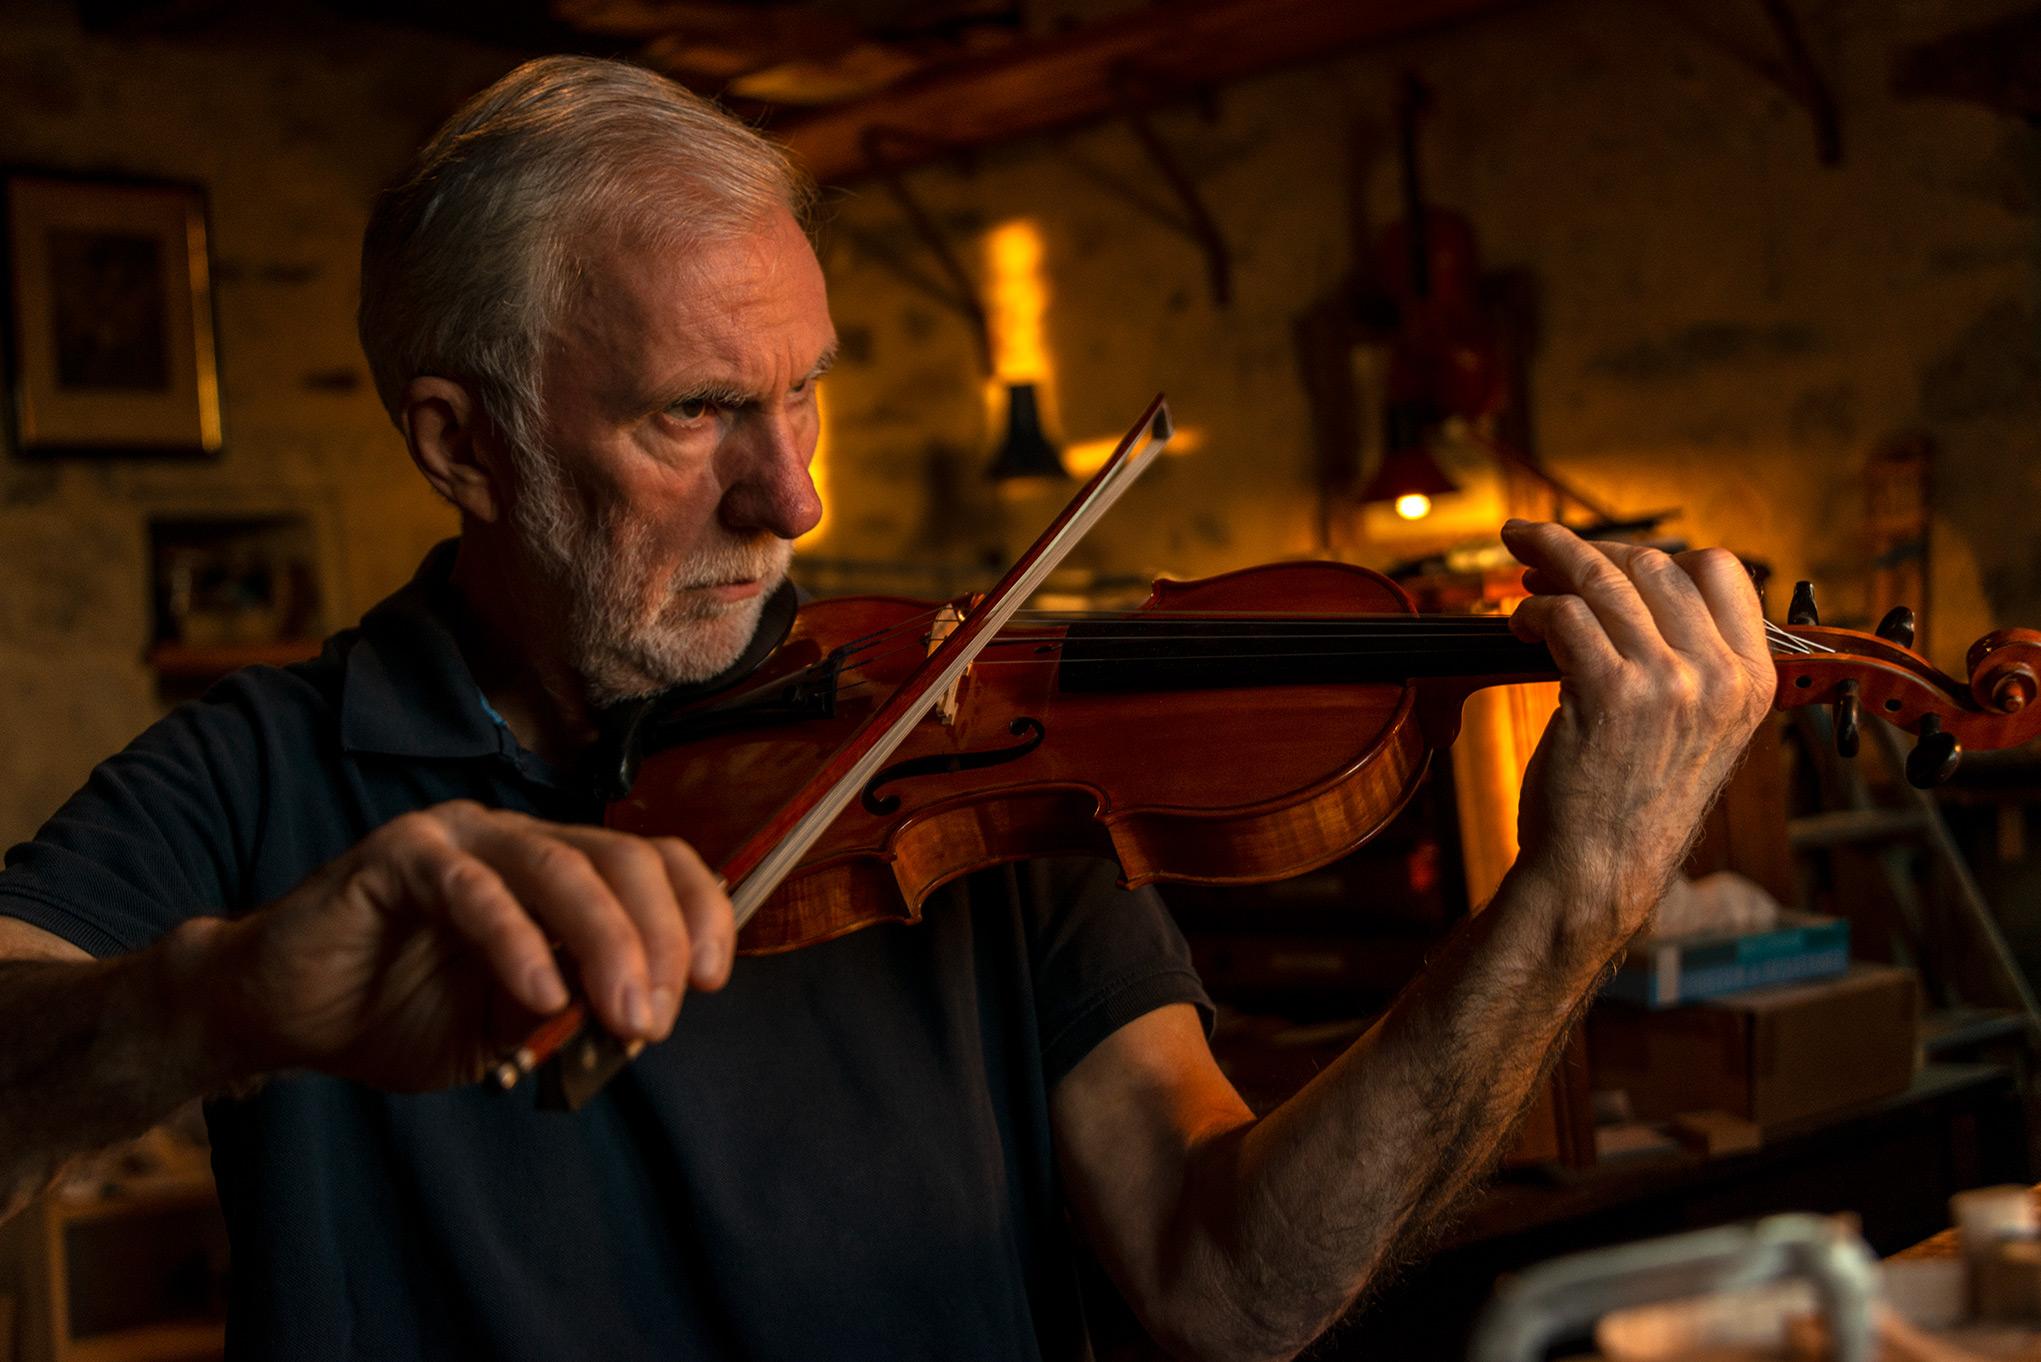 Christian Urbita - French Luthier (violin maker)